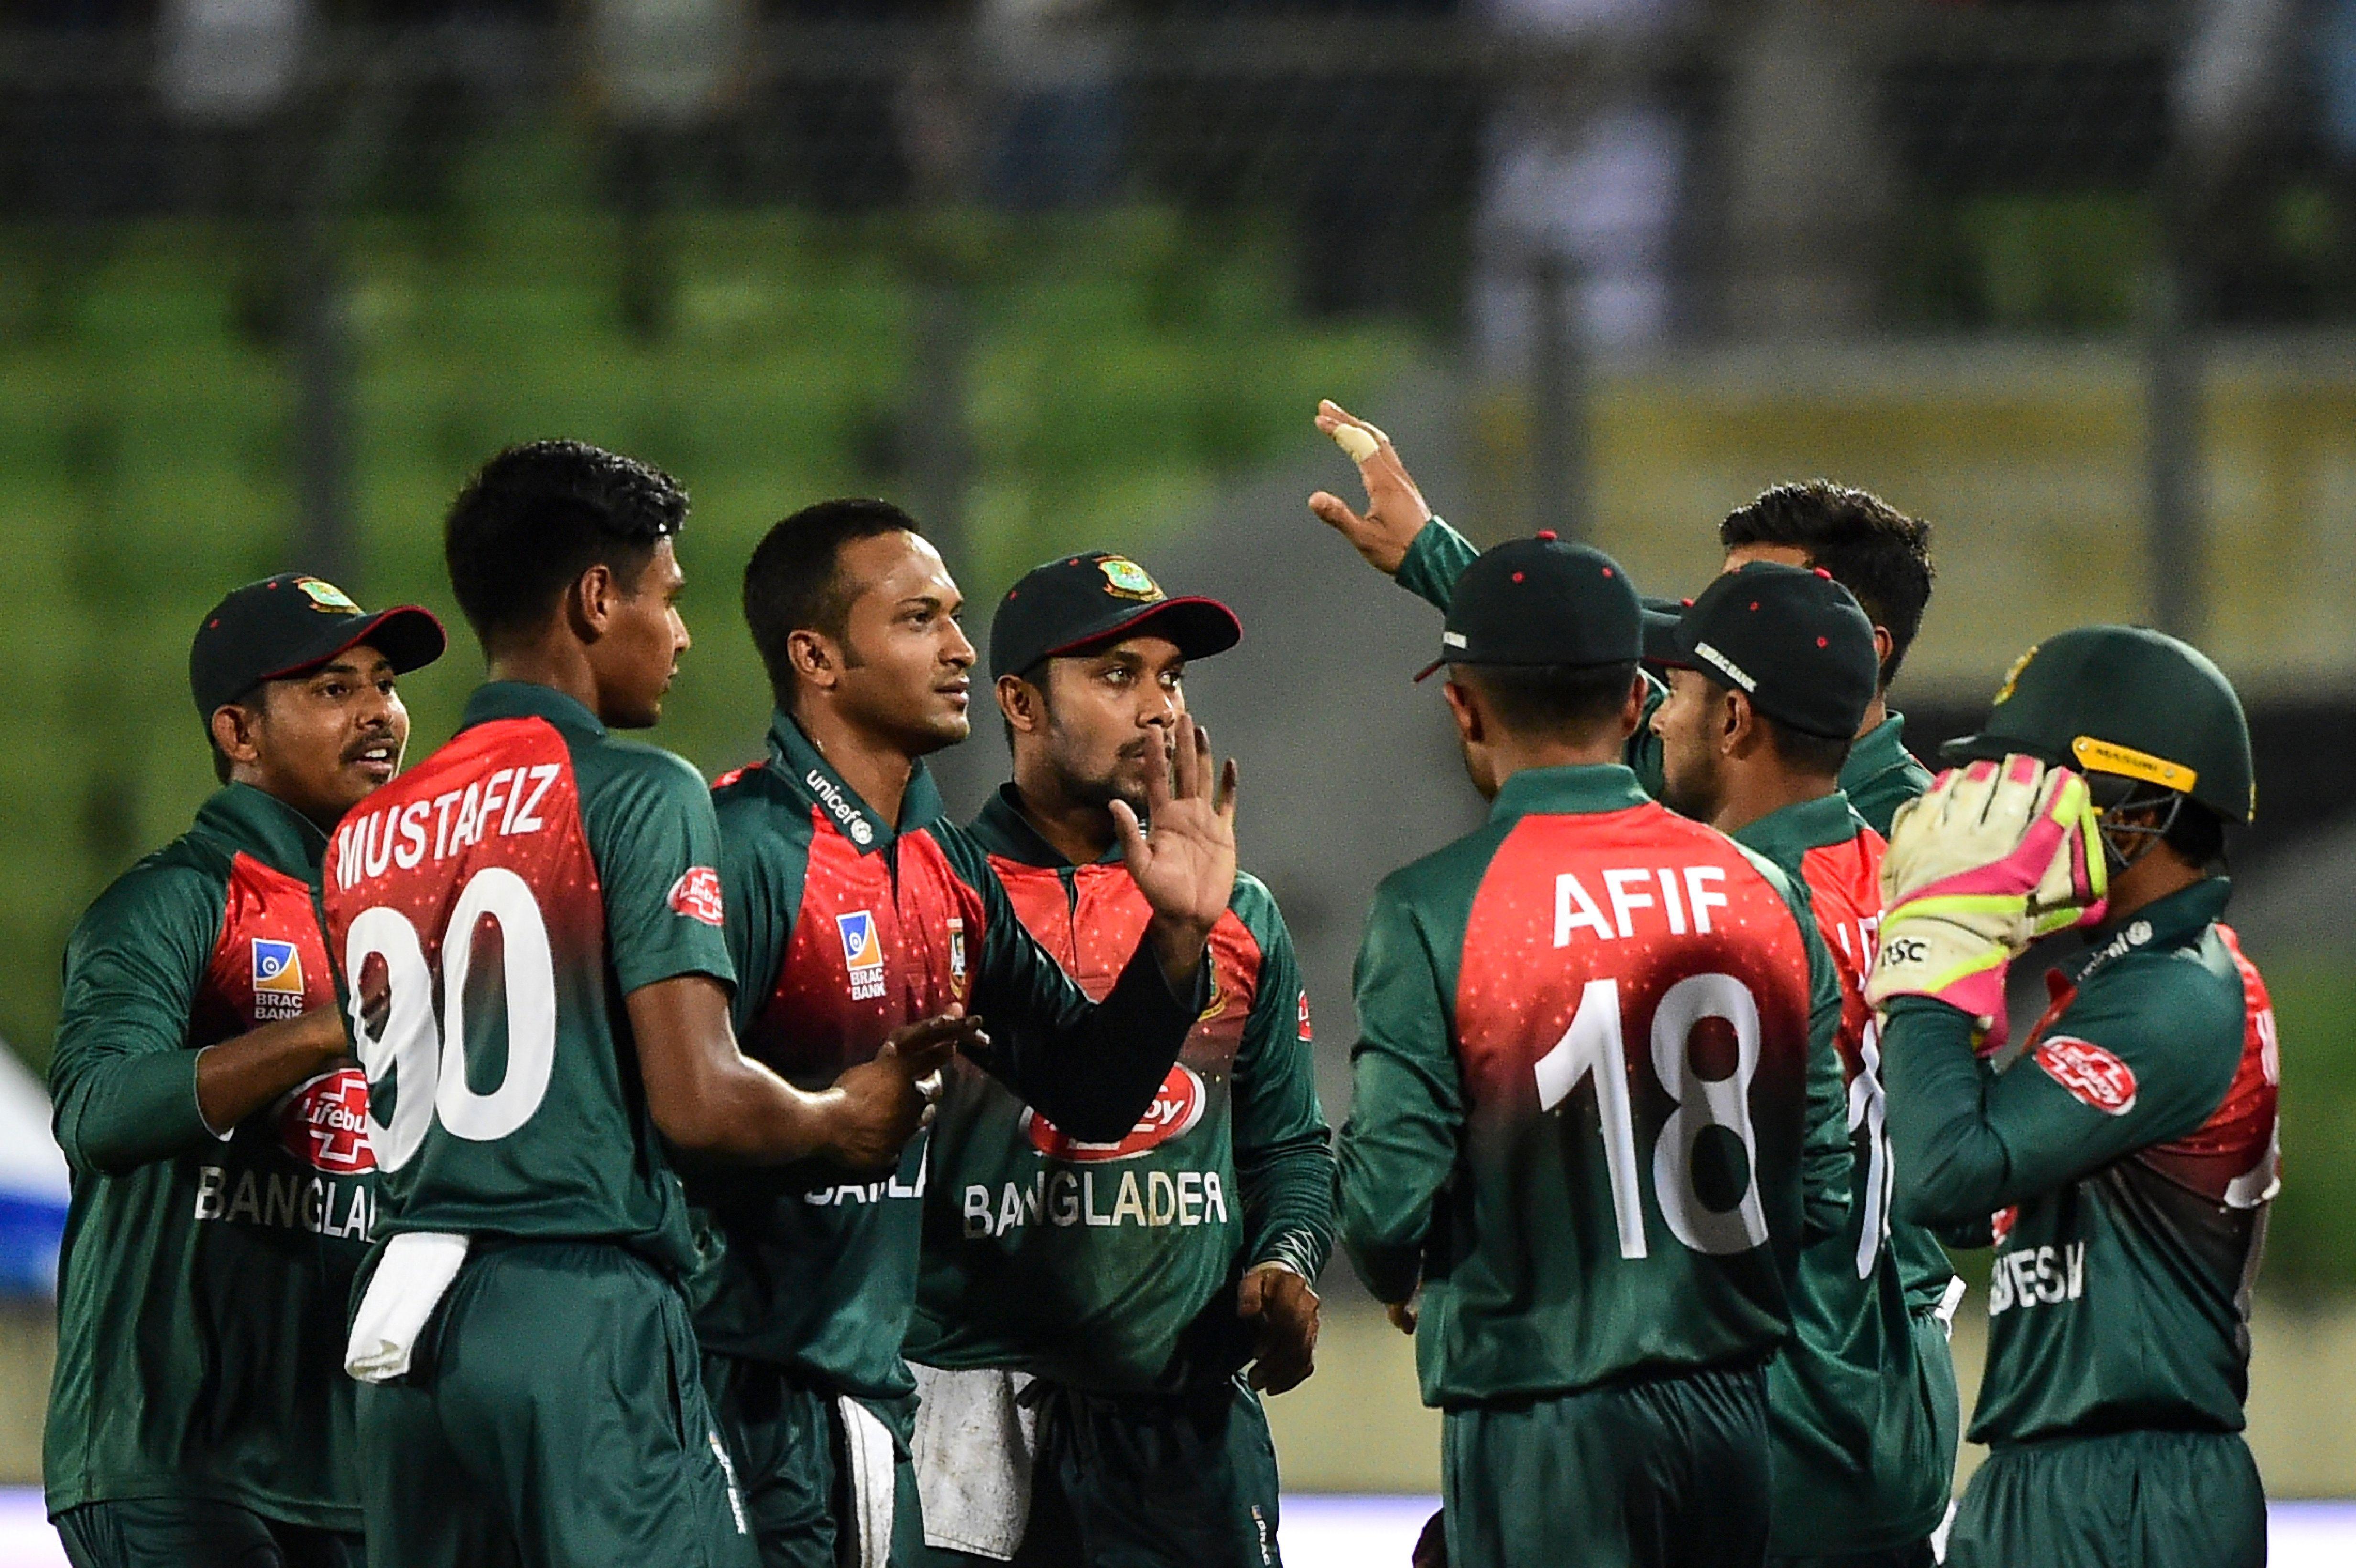 All-round Shakib gives Bangladesh momentum heading into tri-series final